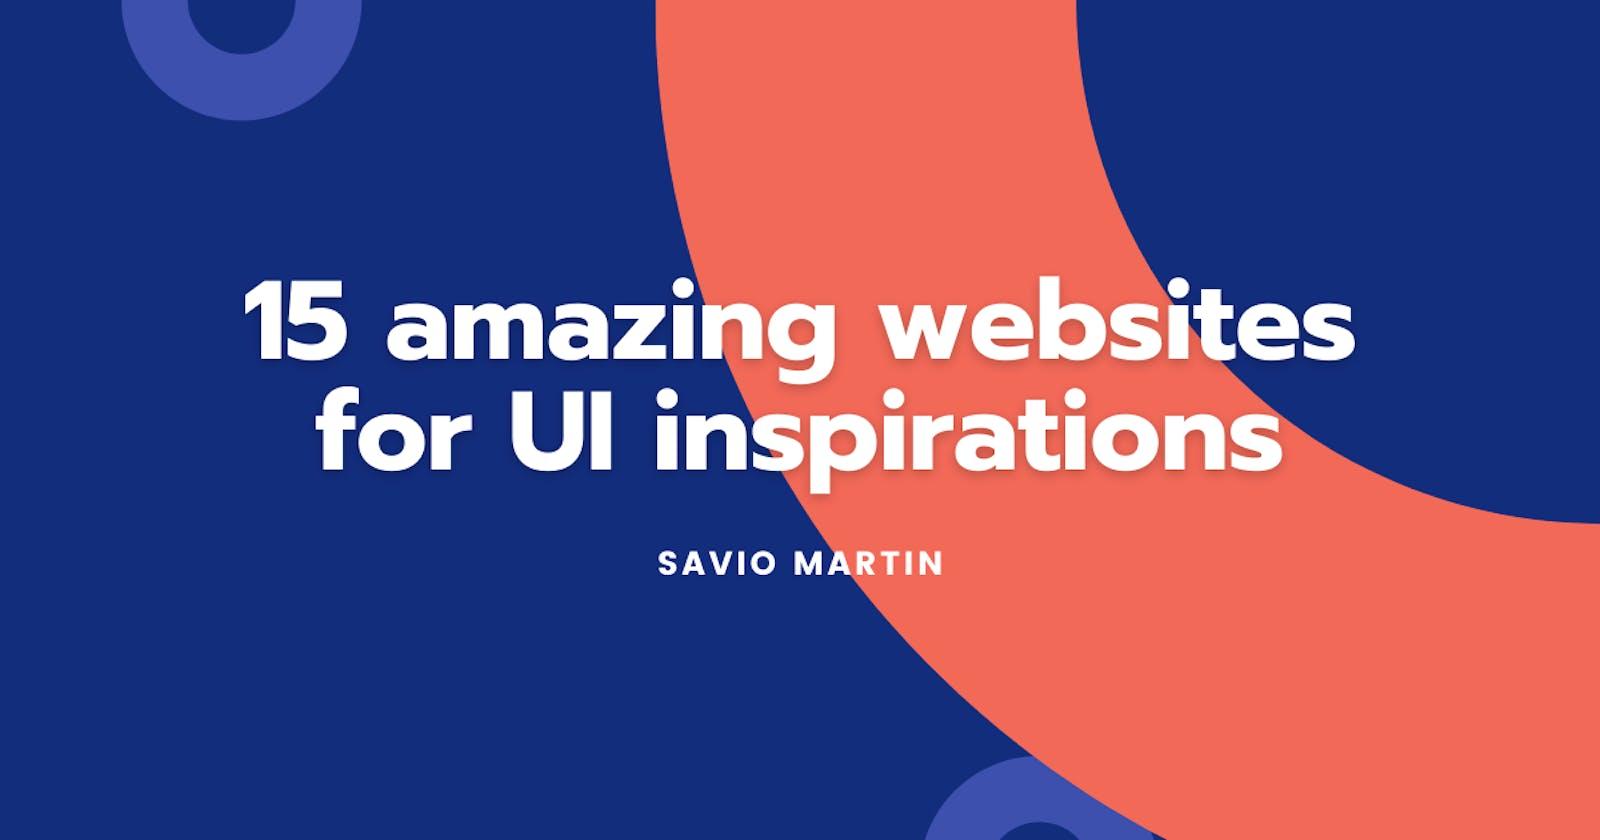 15 amazing websites for UI inspirations 💖